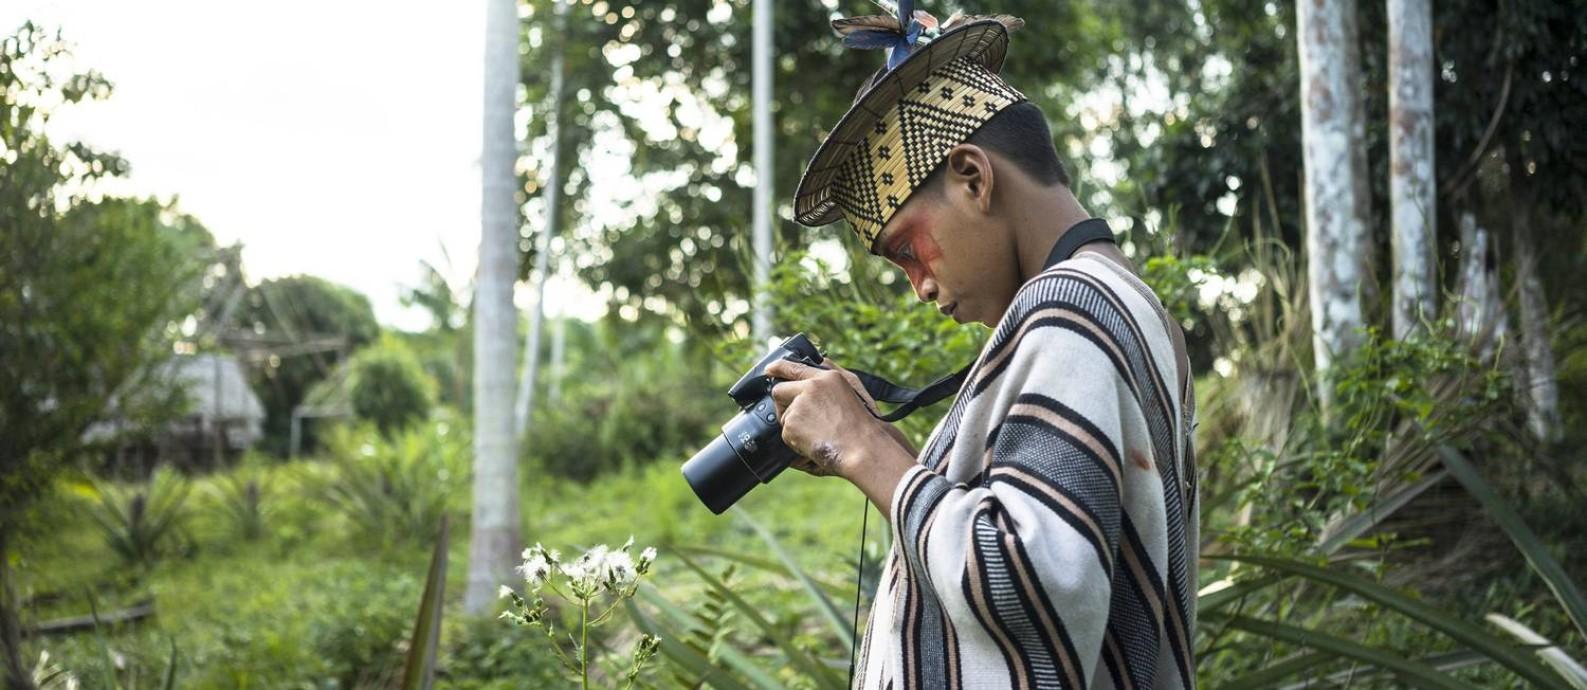 Thokiriyari Piyãko fotografando com câmera digital na oficina de 2018 Foto: Pedro Kuperman